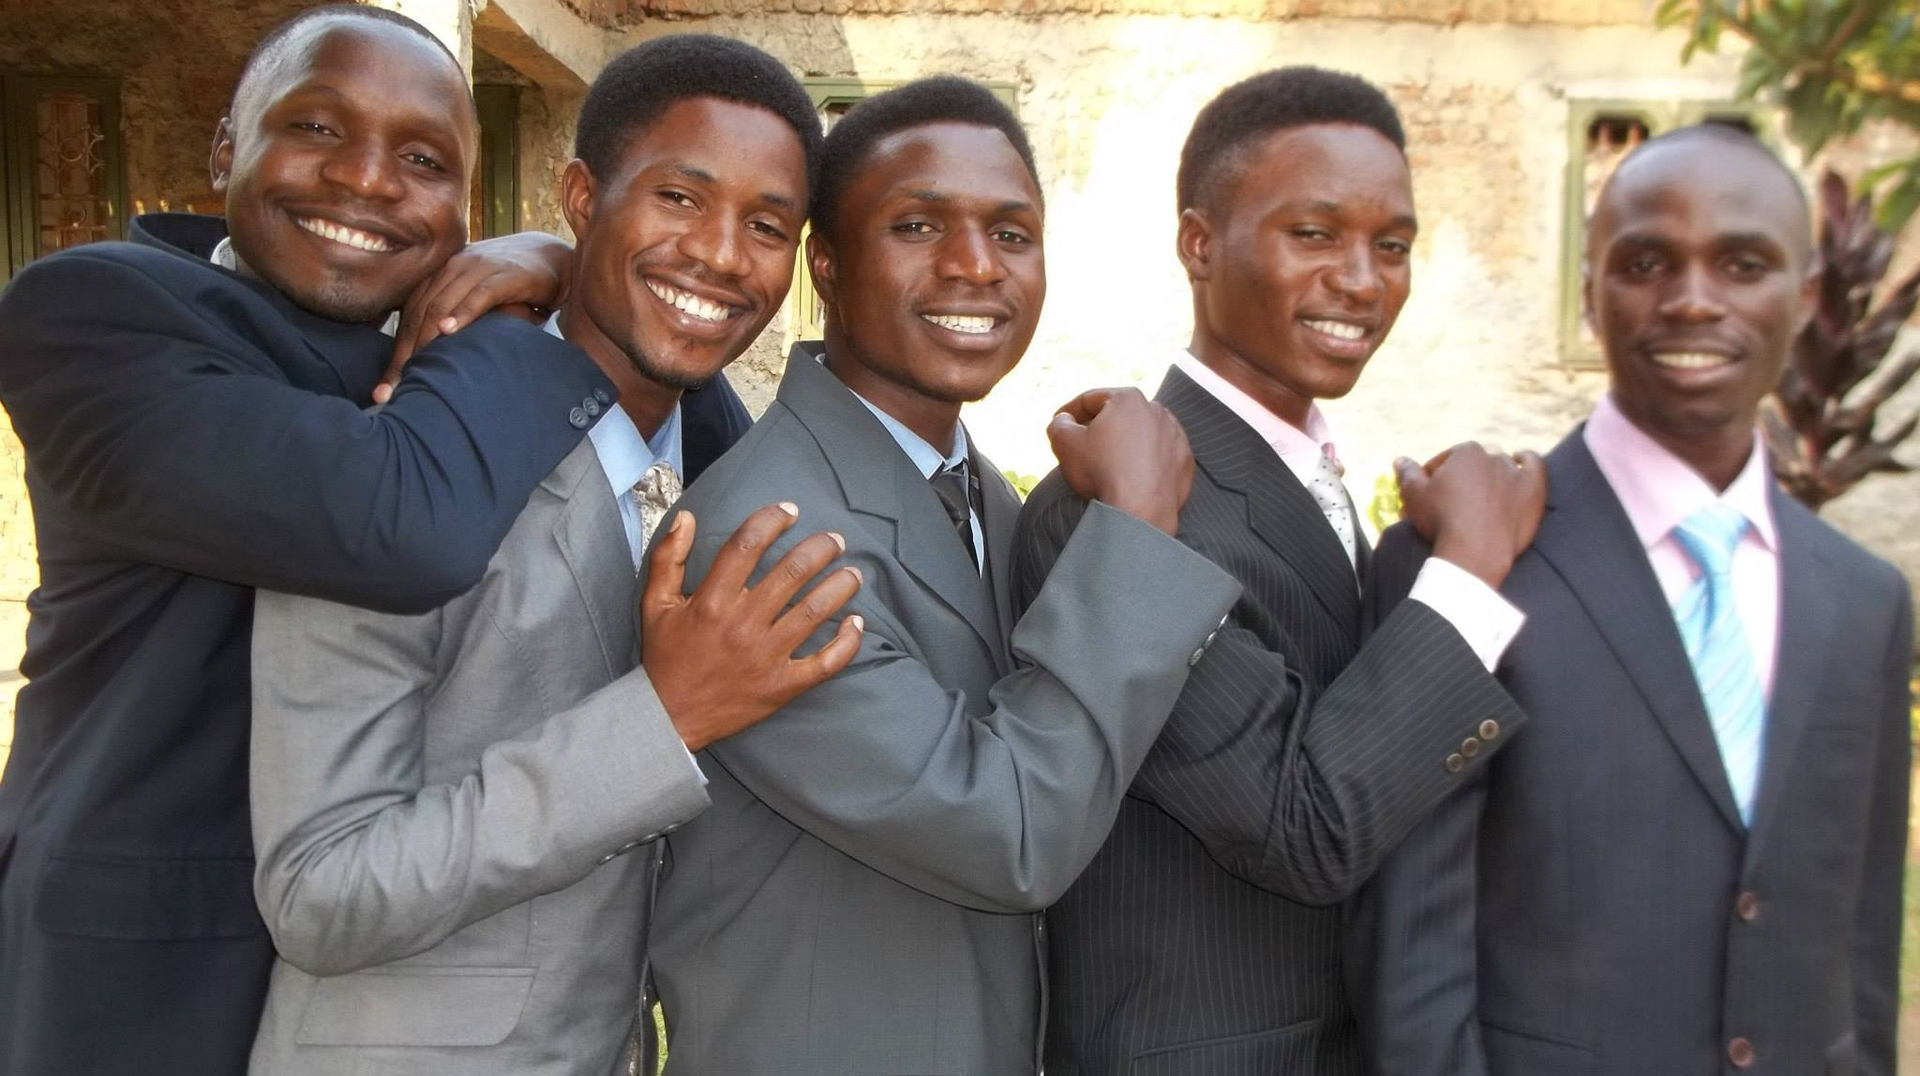 Beş Uganda Kardeşleri: (L - R) Idine Membere, Edwin Bwambale, Godwin Tusime, Harrison Thembo ve Cleave Masereka.